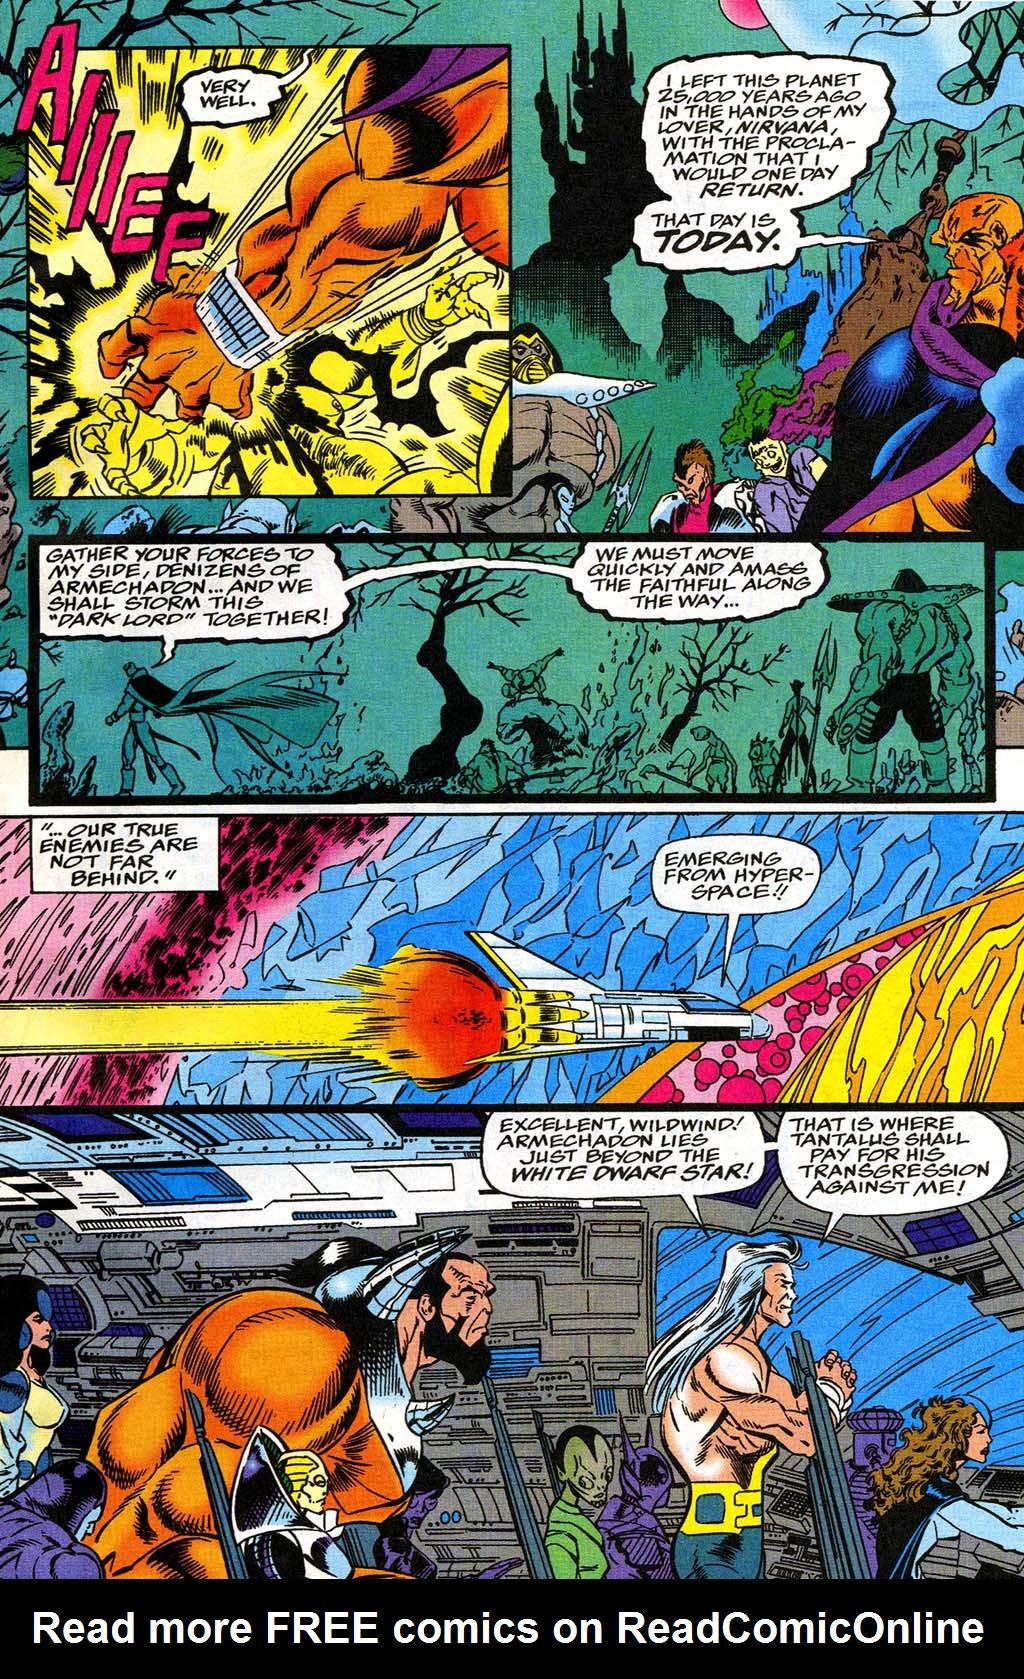 Read online Blackwulf comic -  Issue #8 - 8